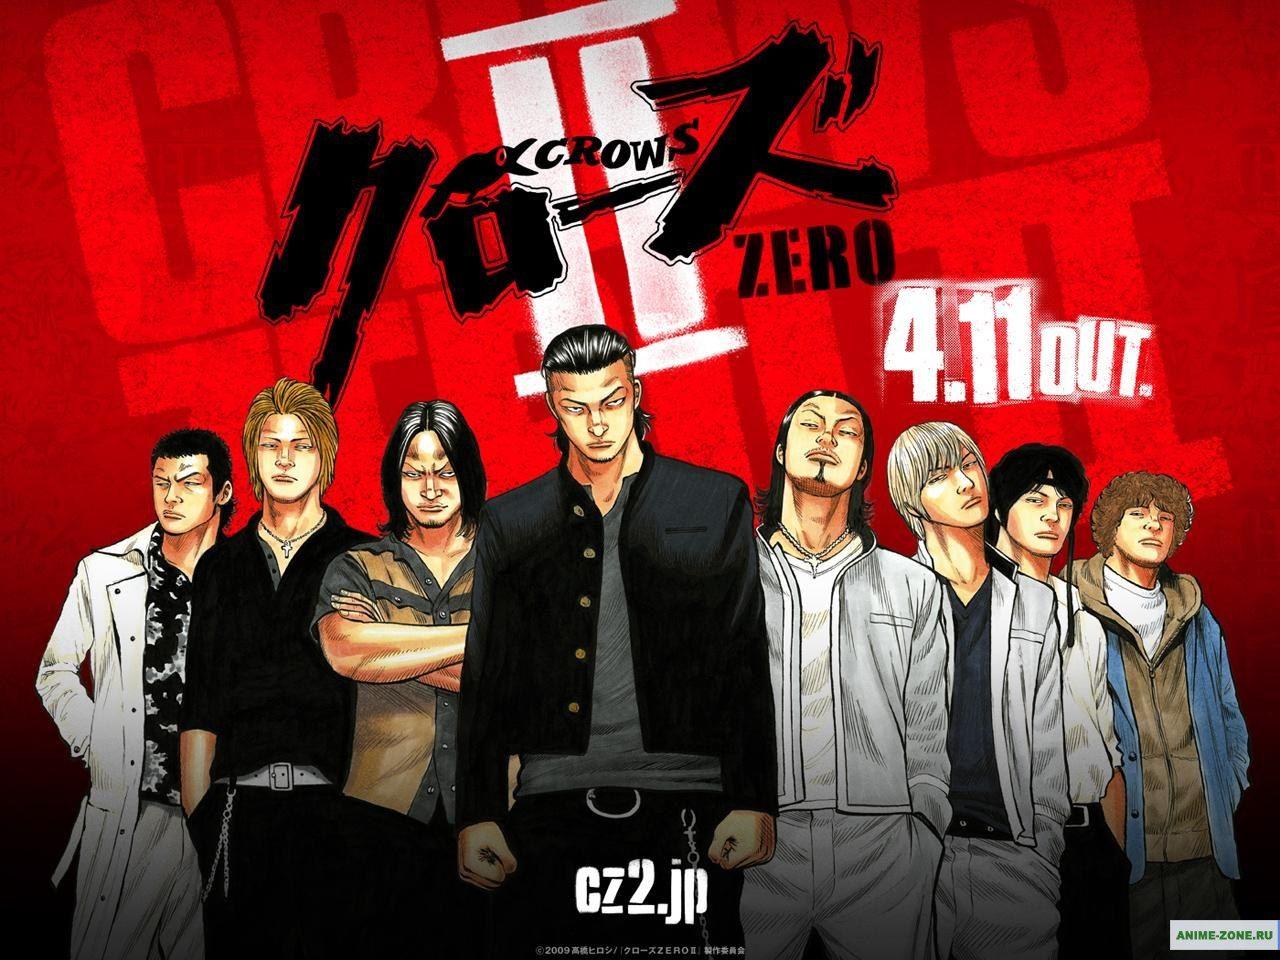 Crows Zero Wallpaper Desktop H Movies Hd Wallpaper